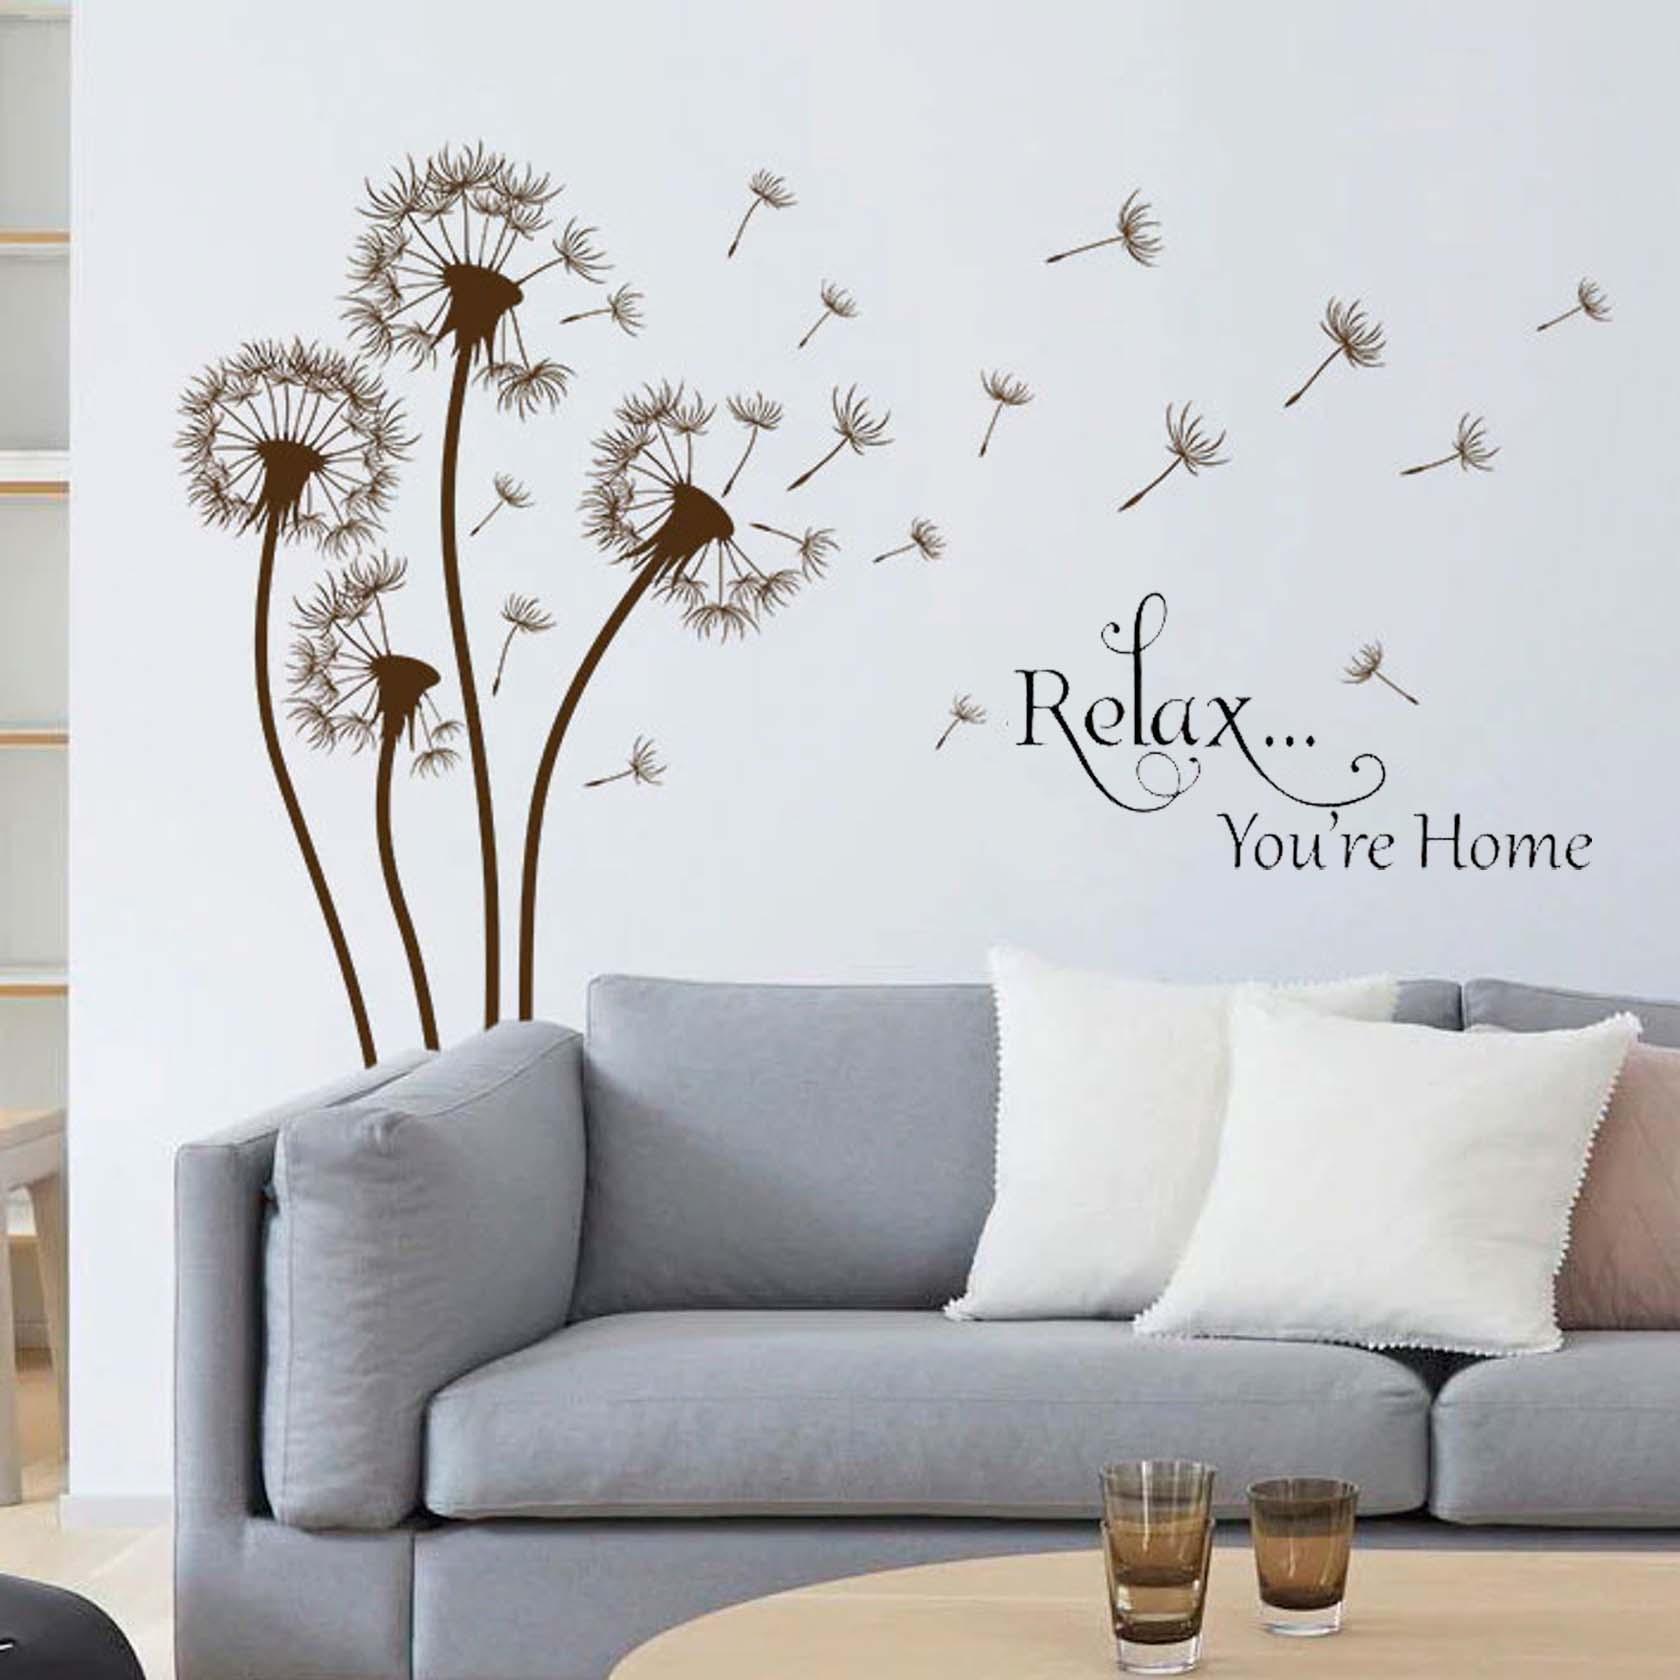 Mydecorative